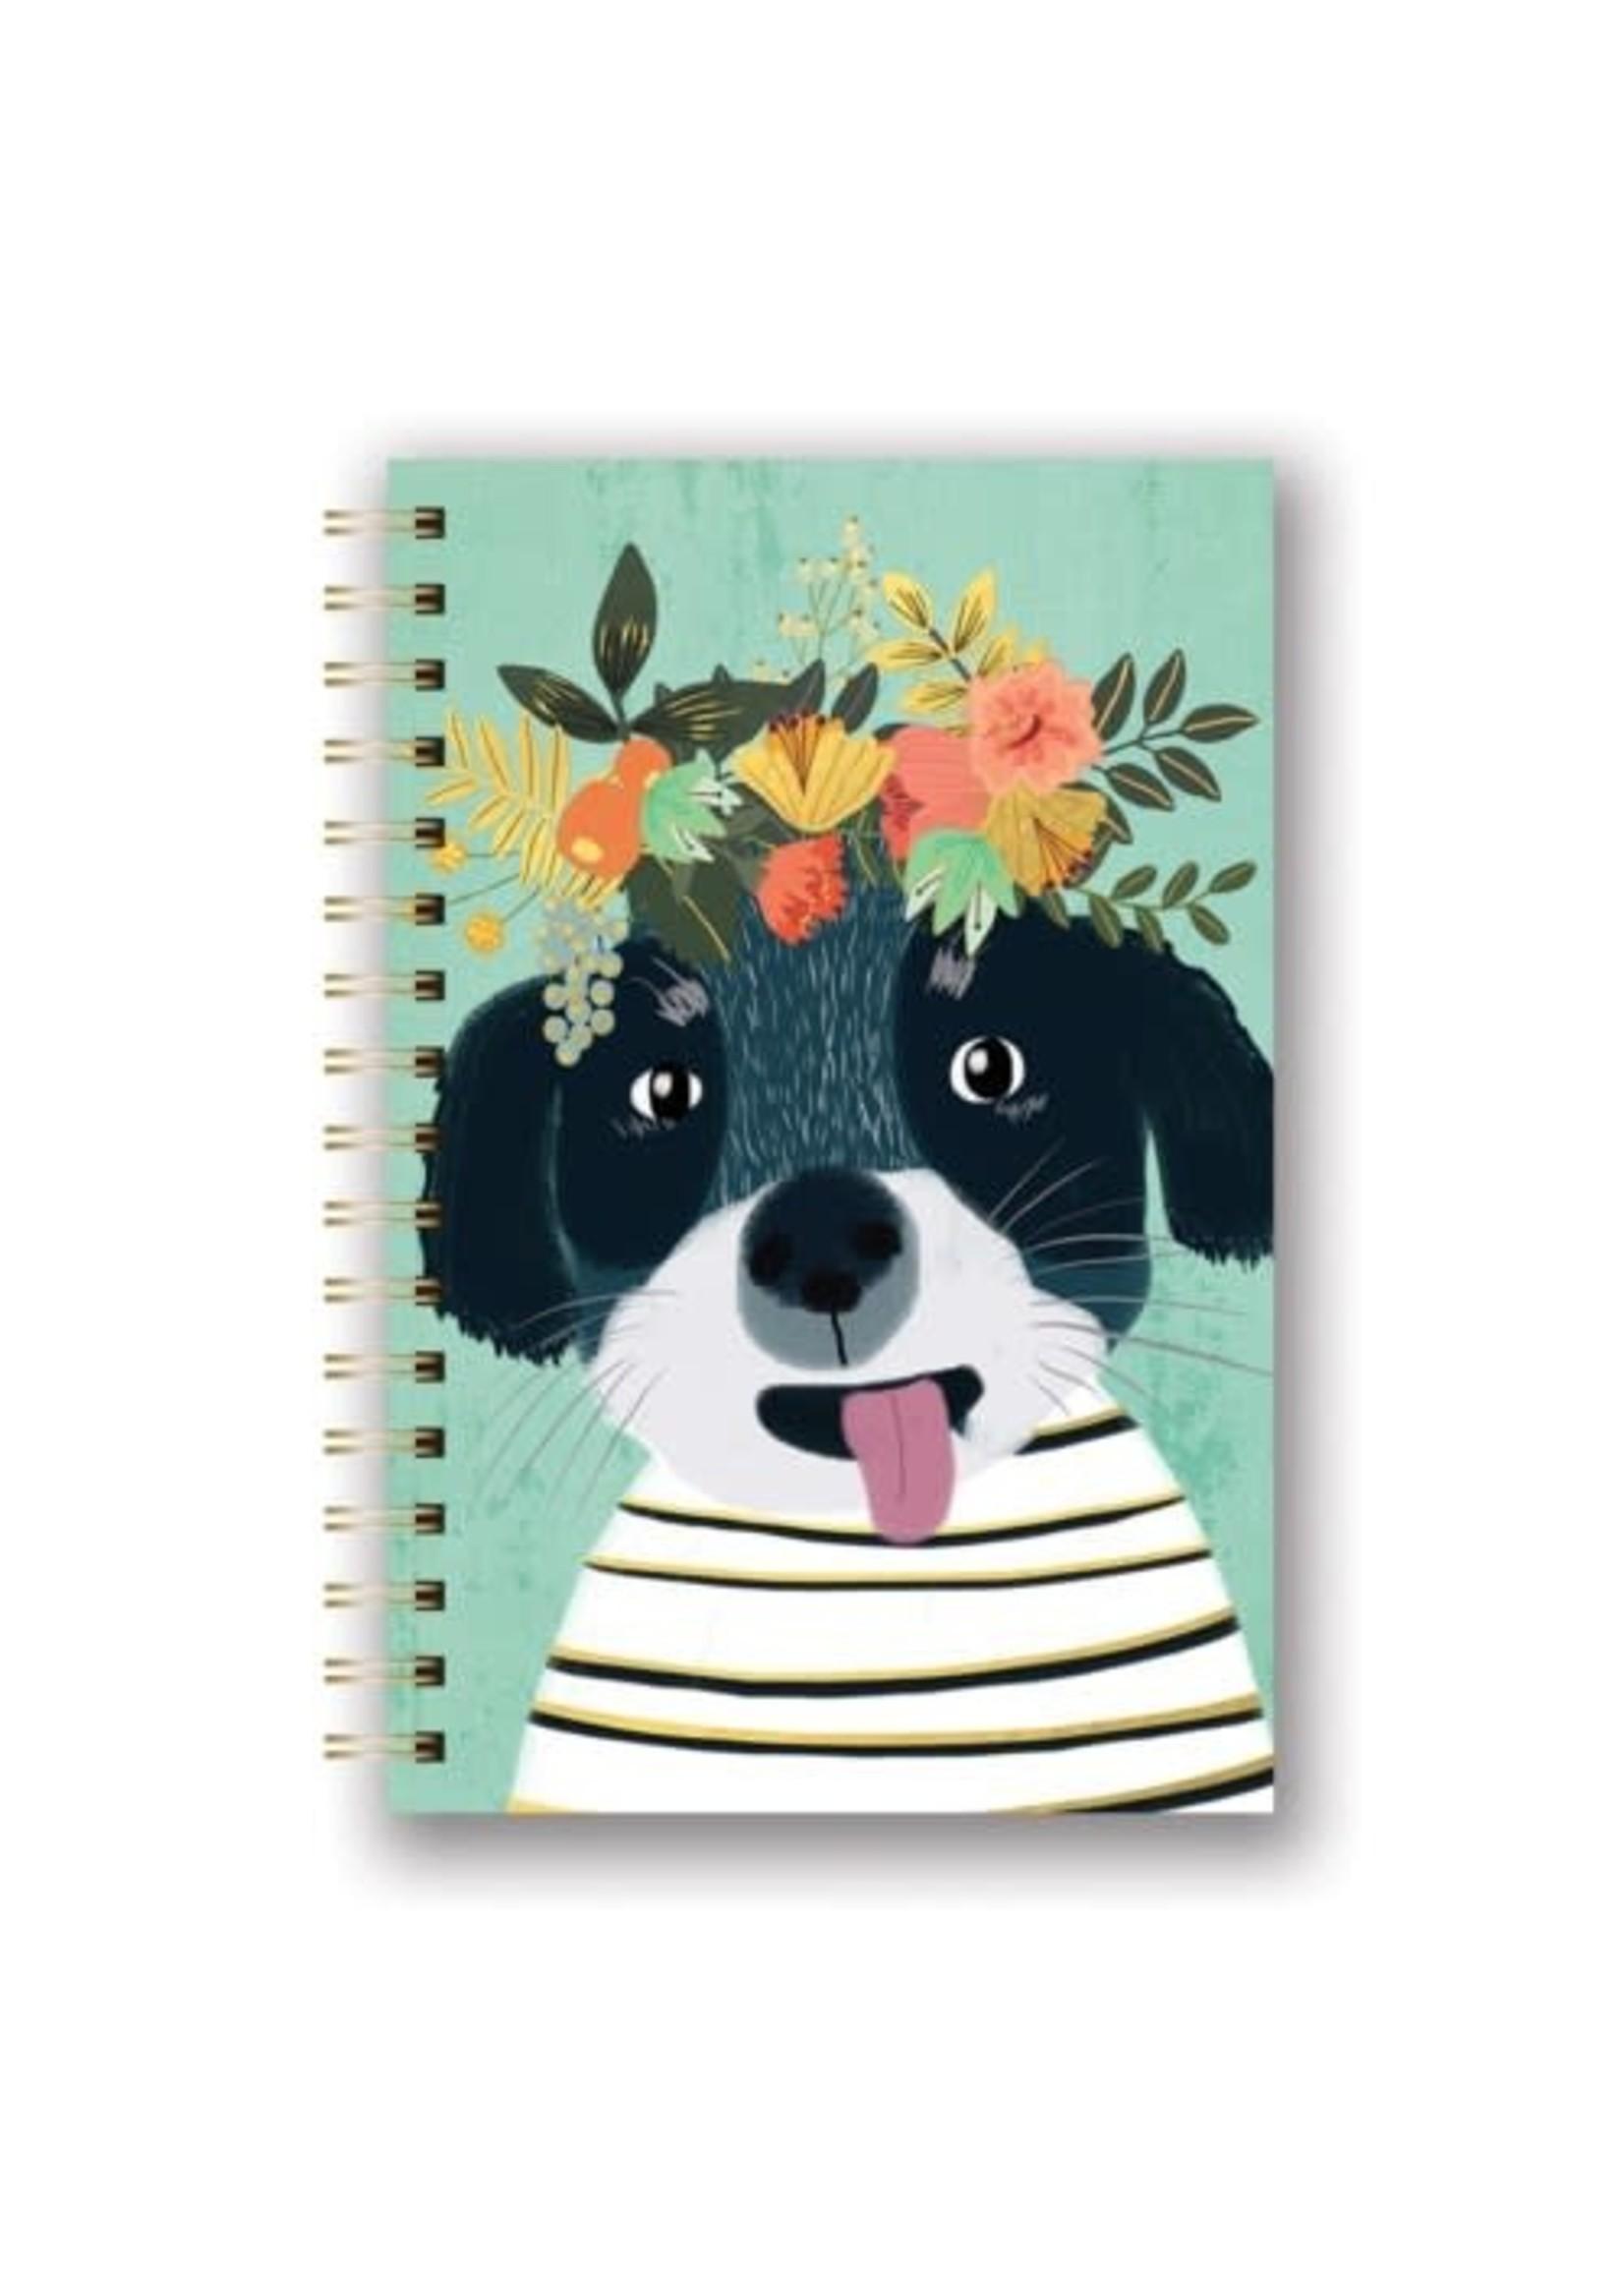 Studio Oh! Spiral Notebook Fancy Dog